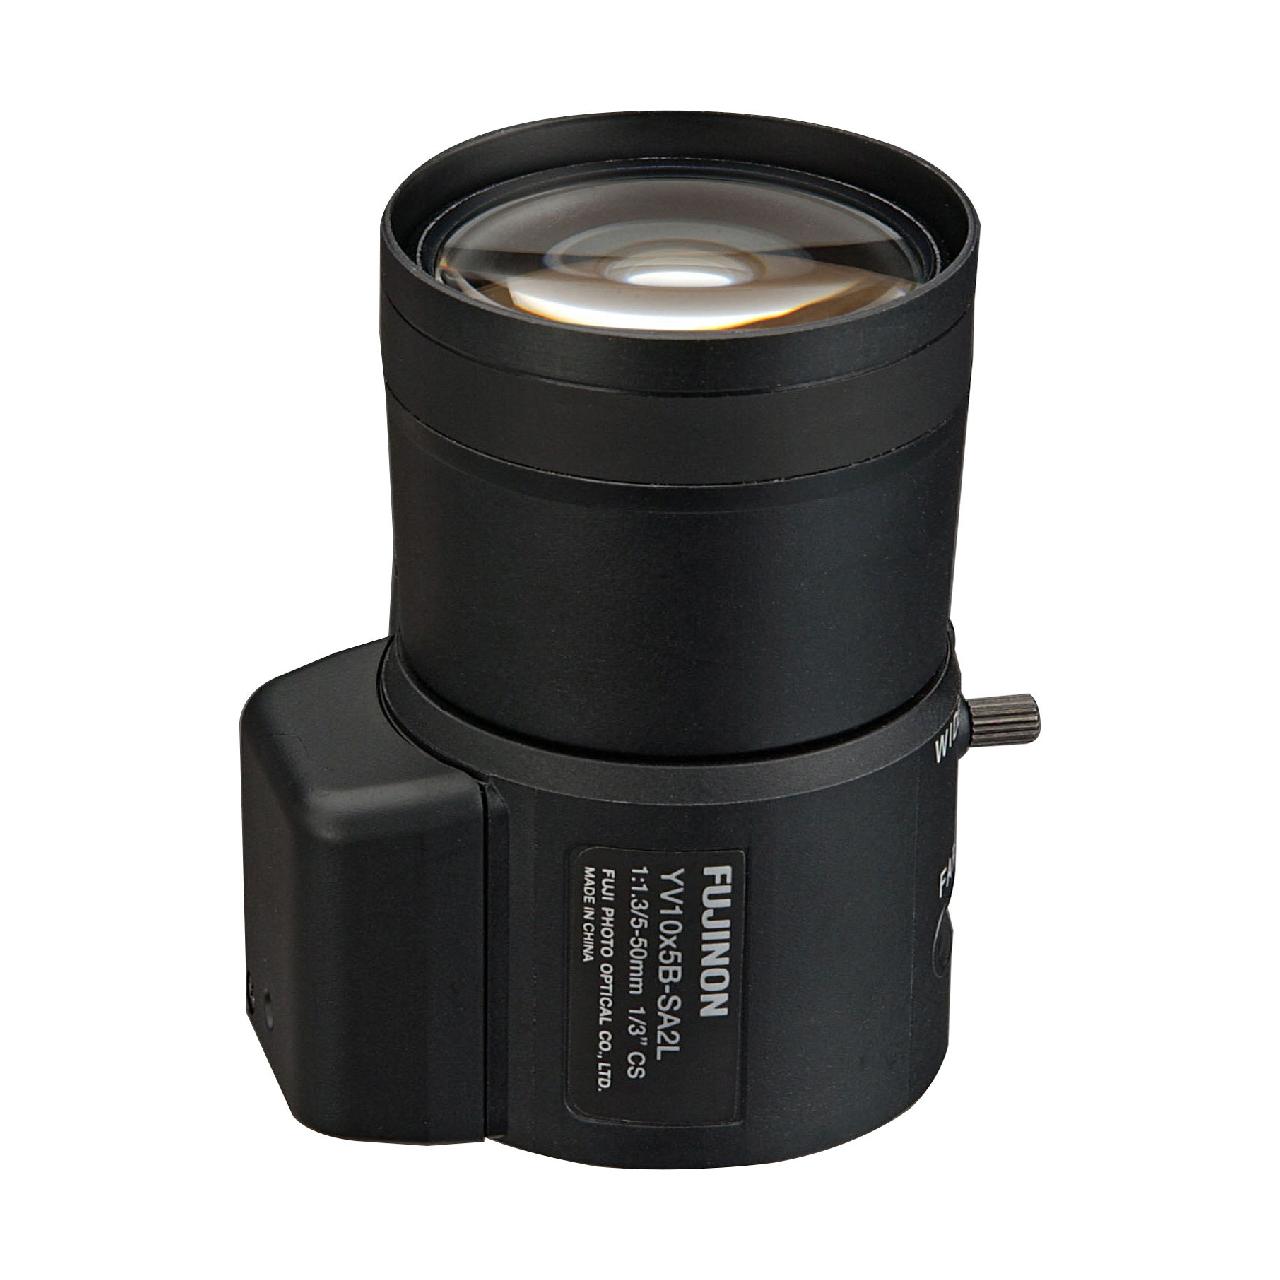 لنز  دوربین مداربسته فوجینون مدل YV10X5B-SA2L